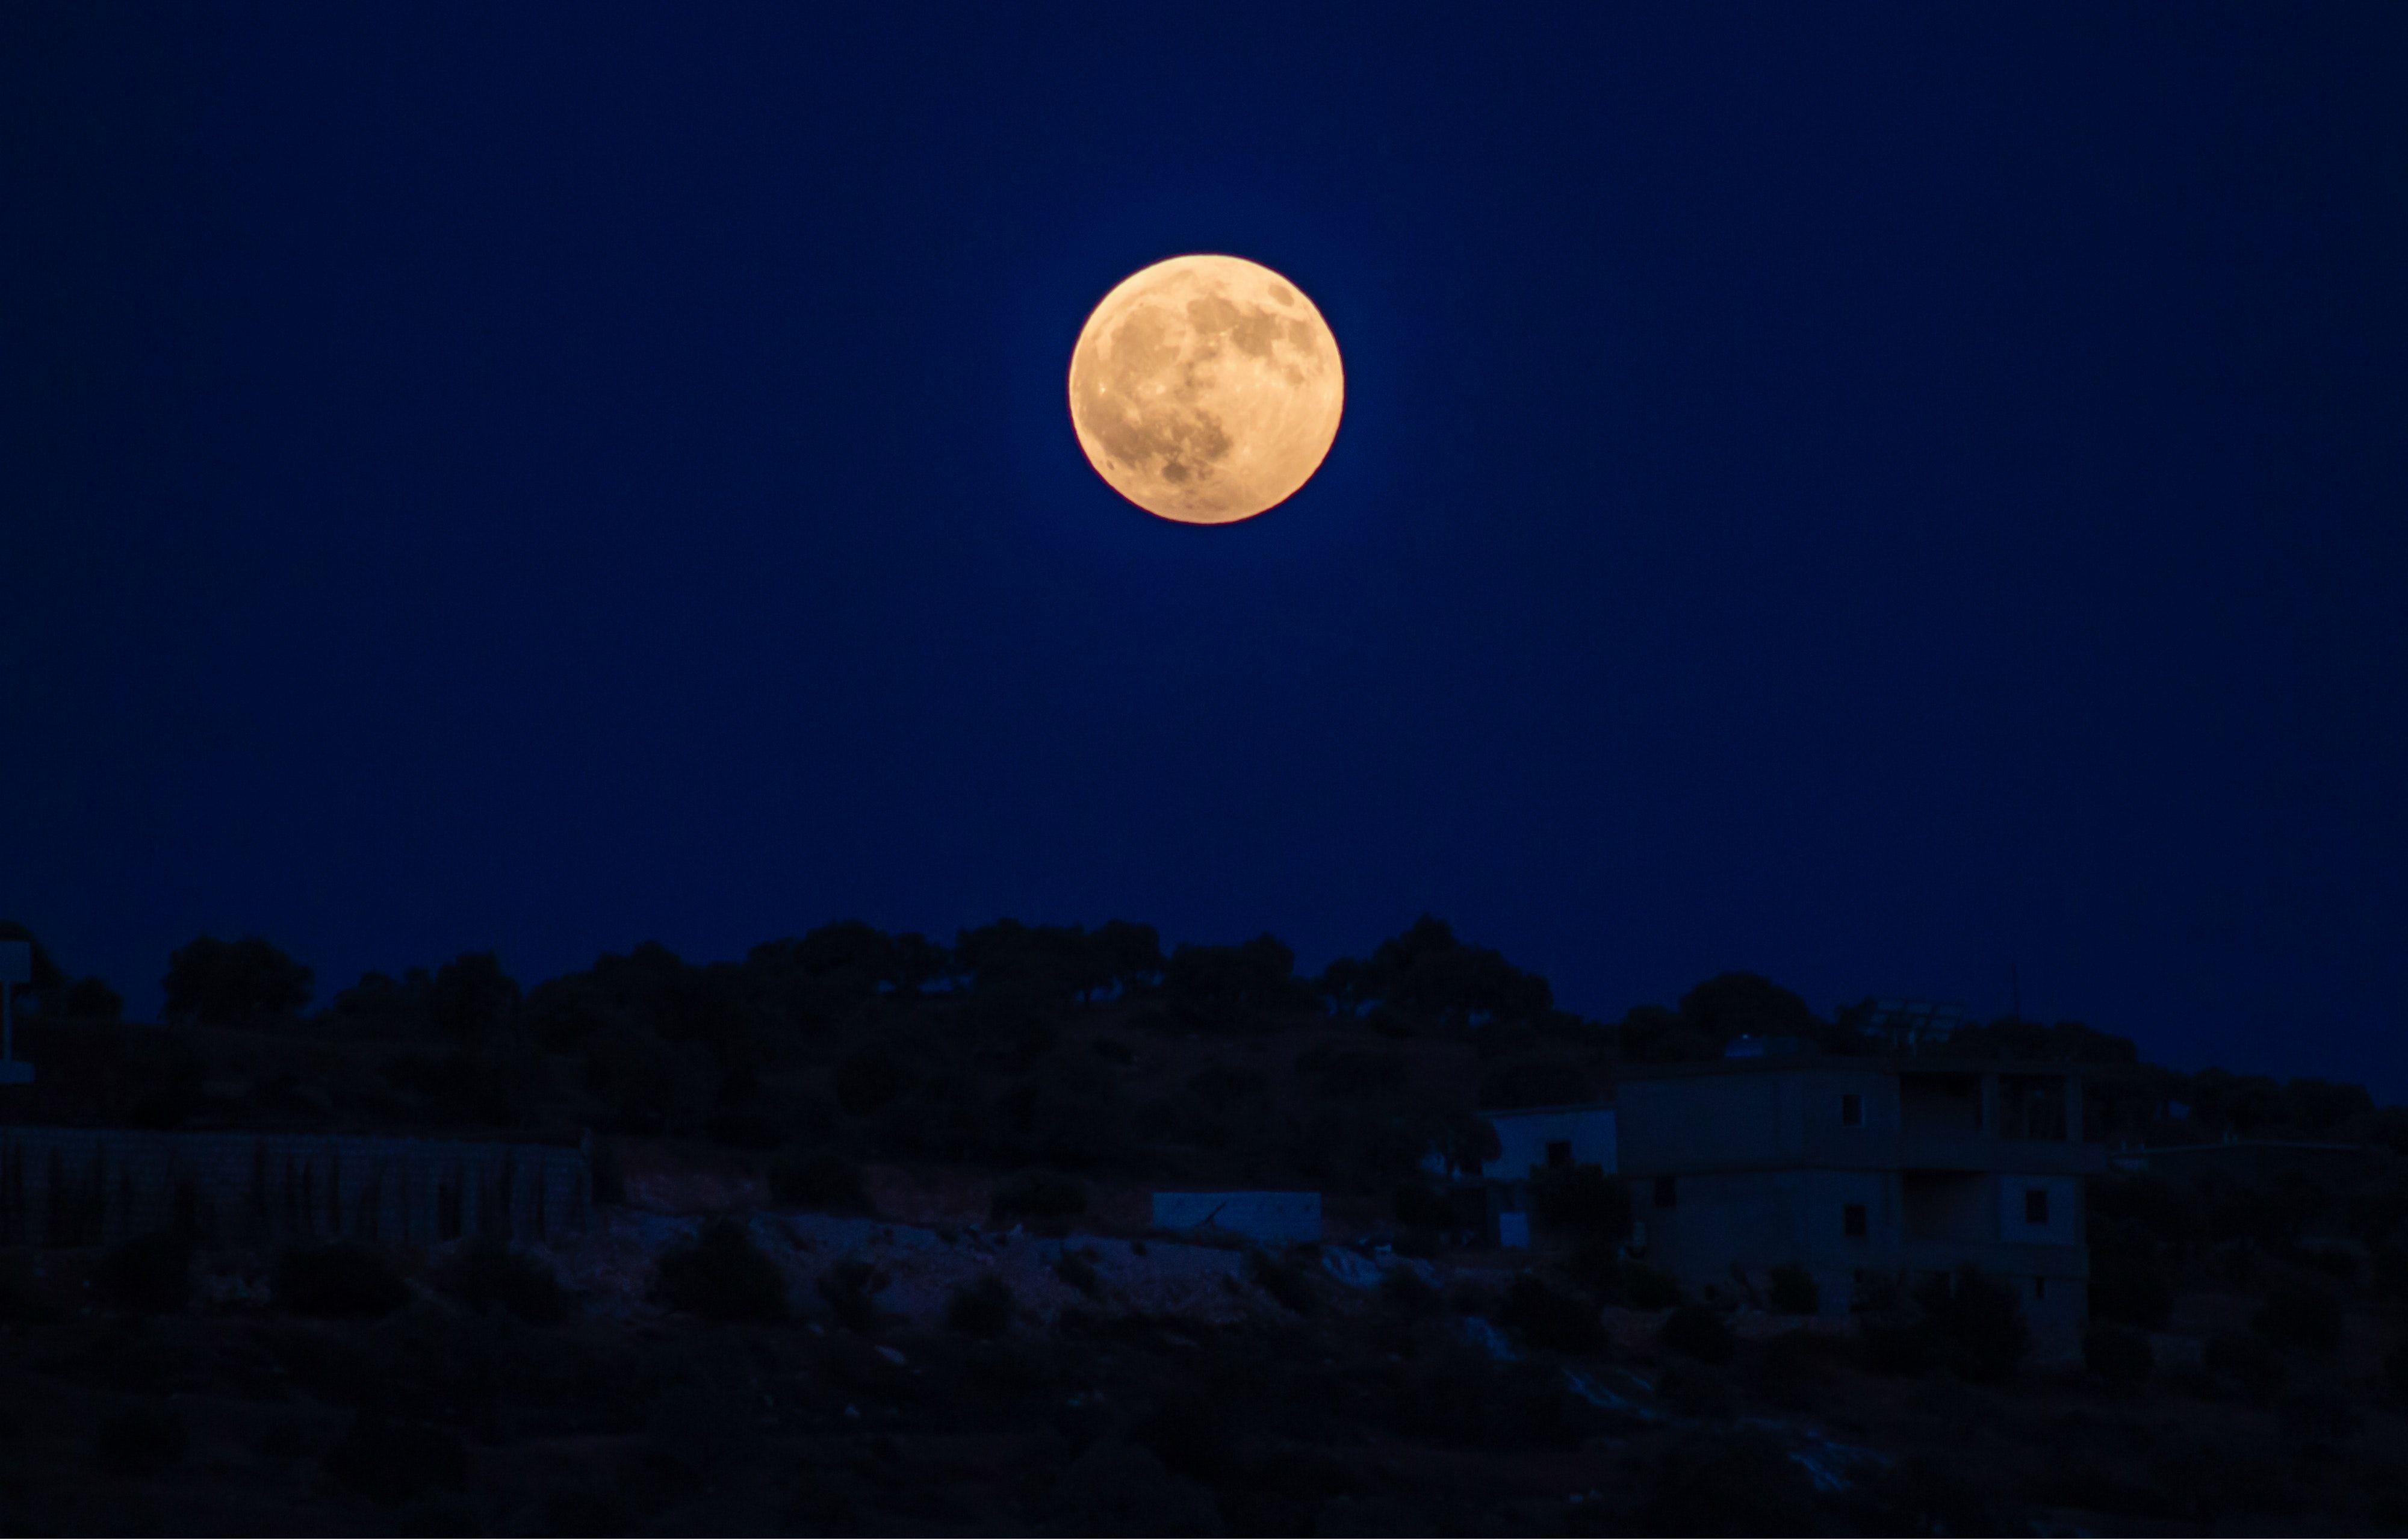 Pin On Lunar Mythologies